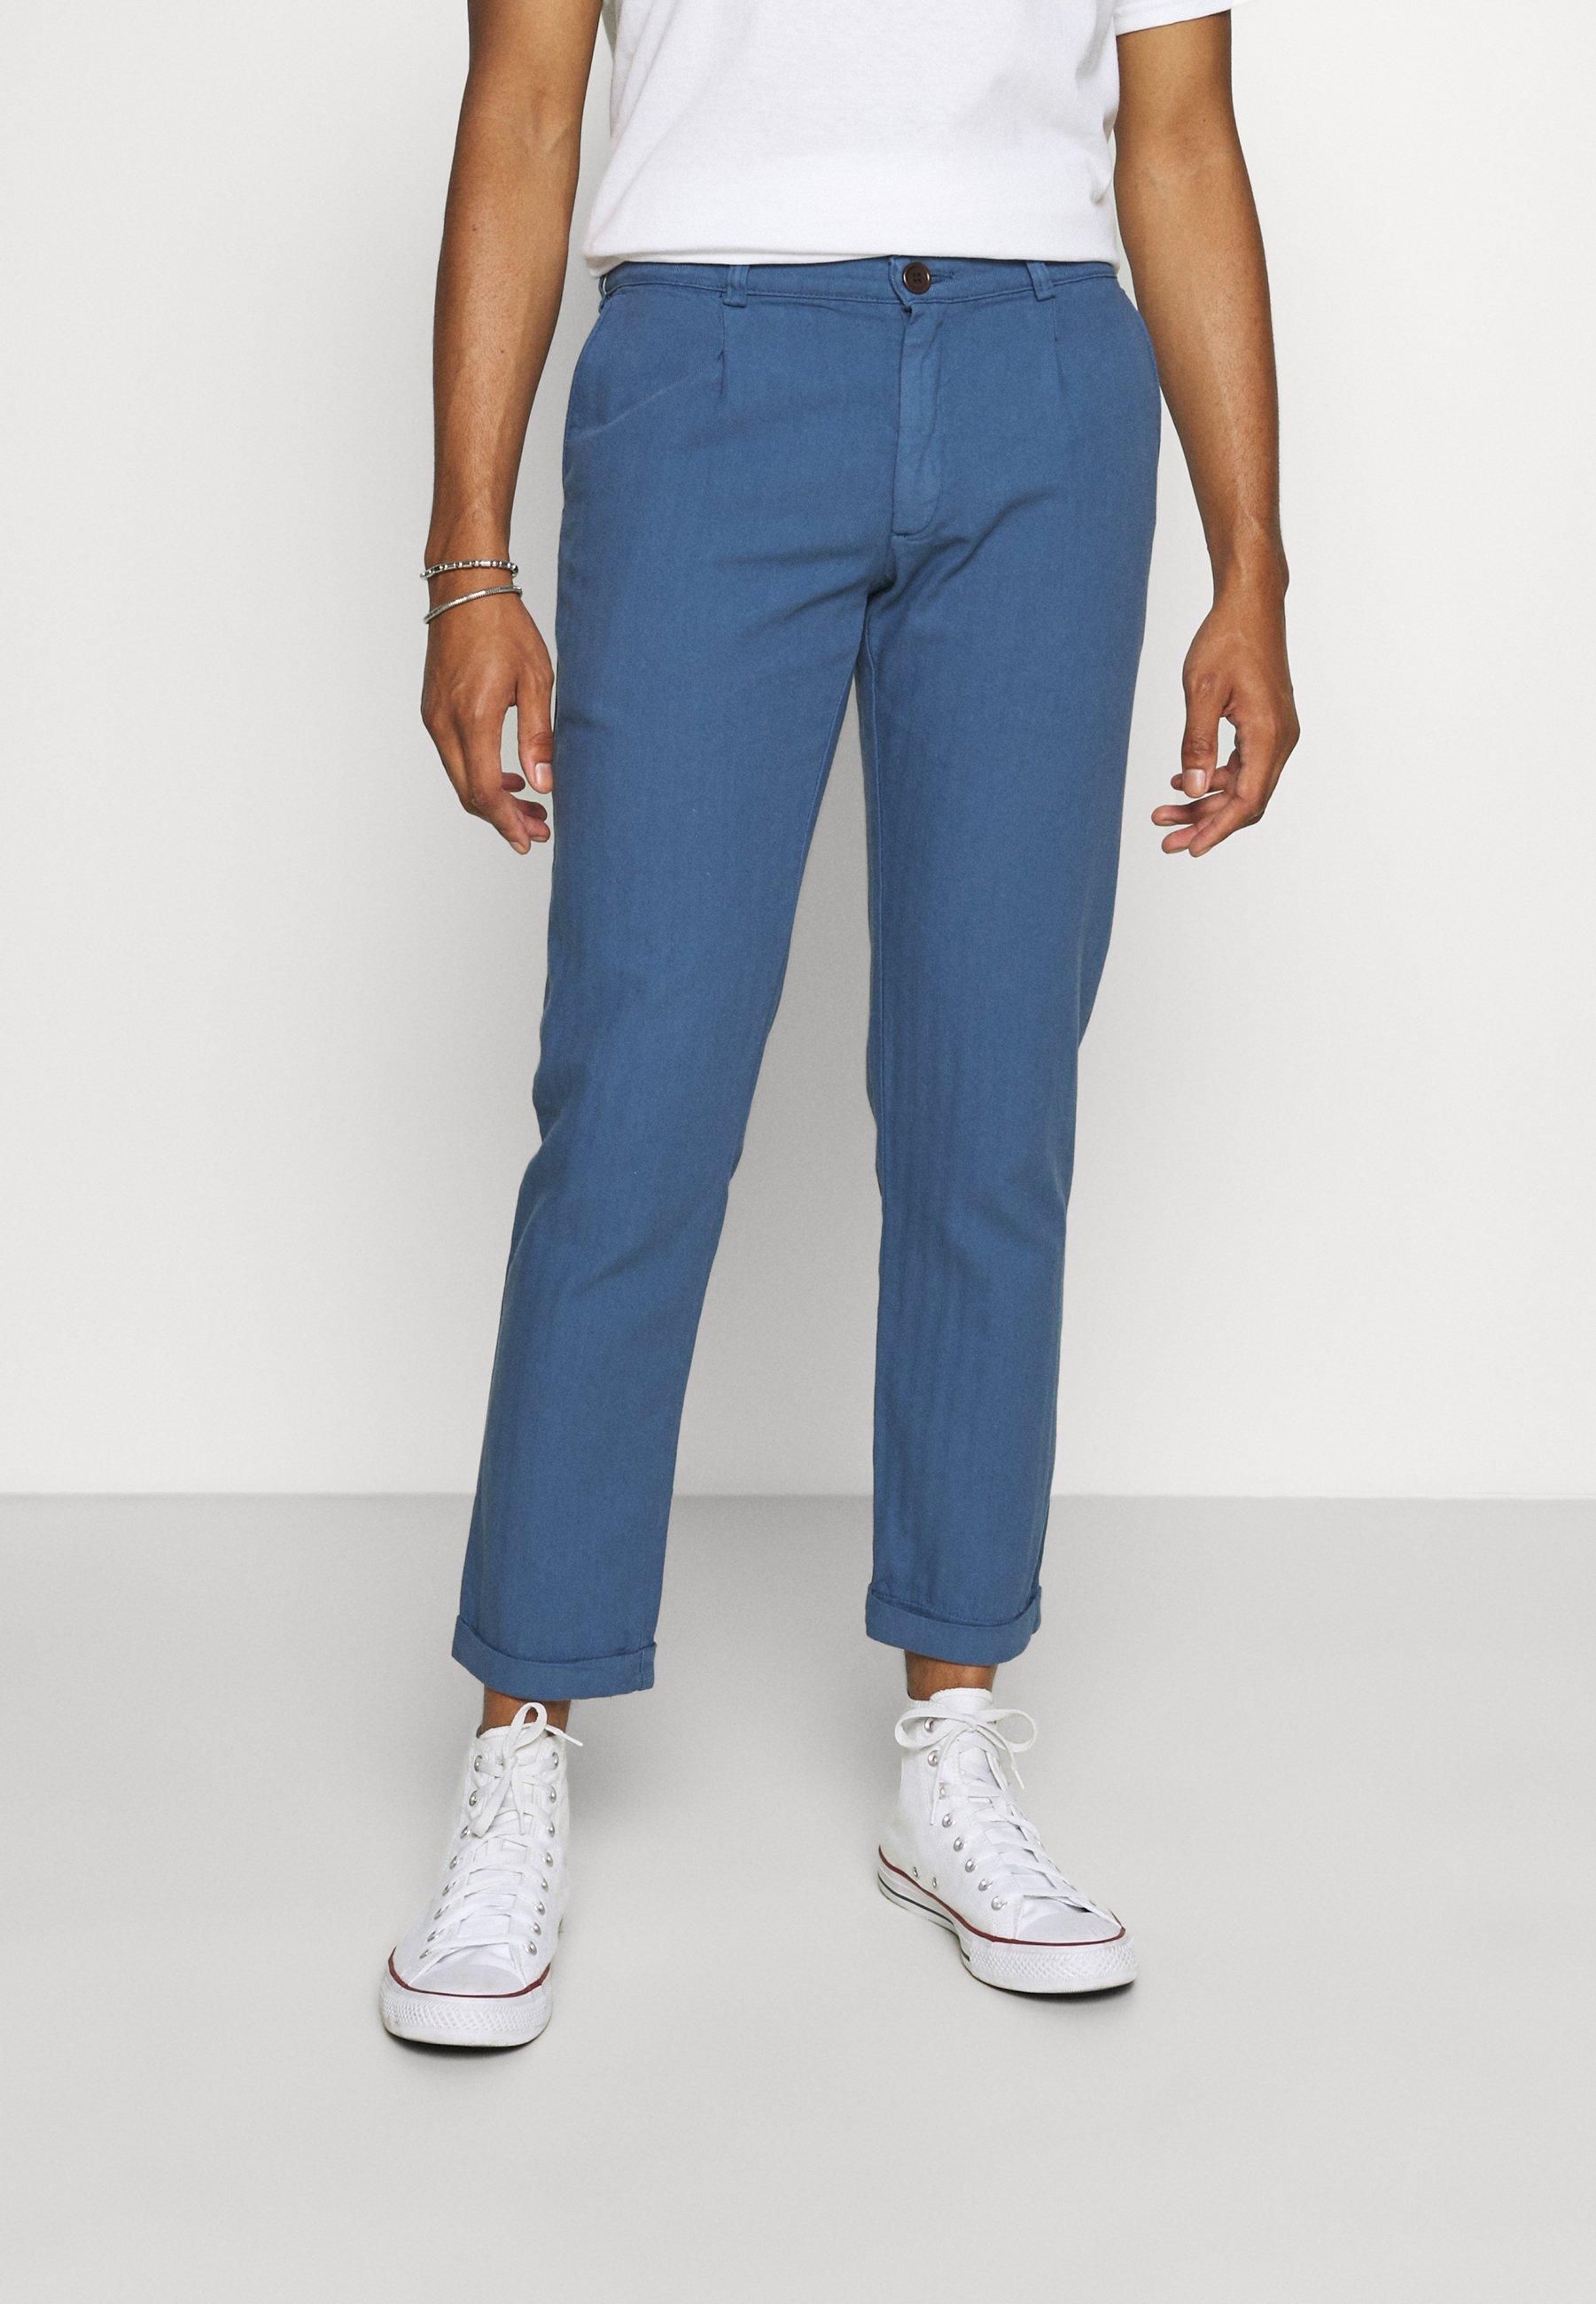 Donna UNISEX PANTS - Pantaloni